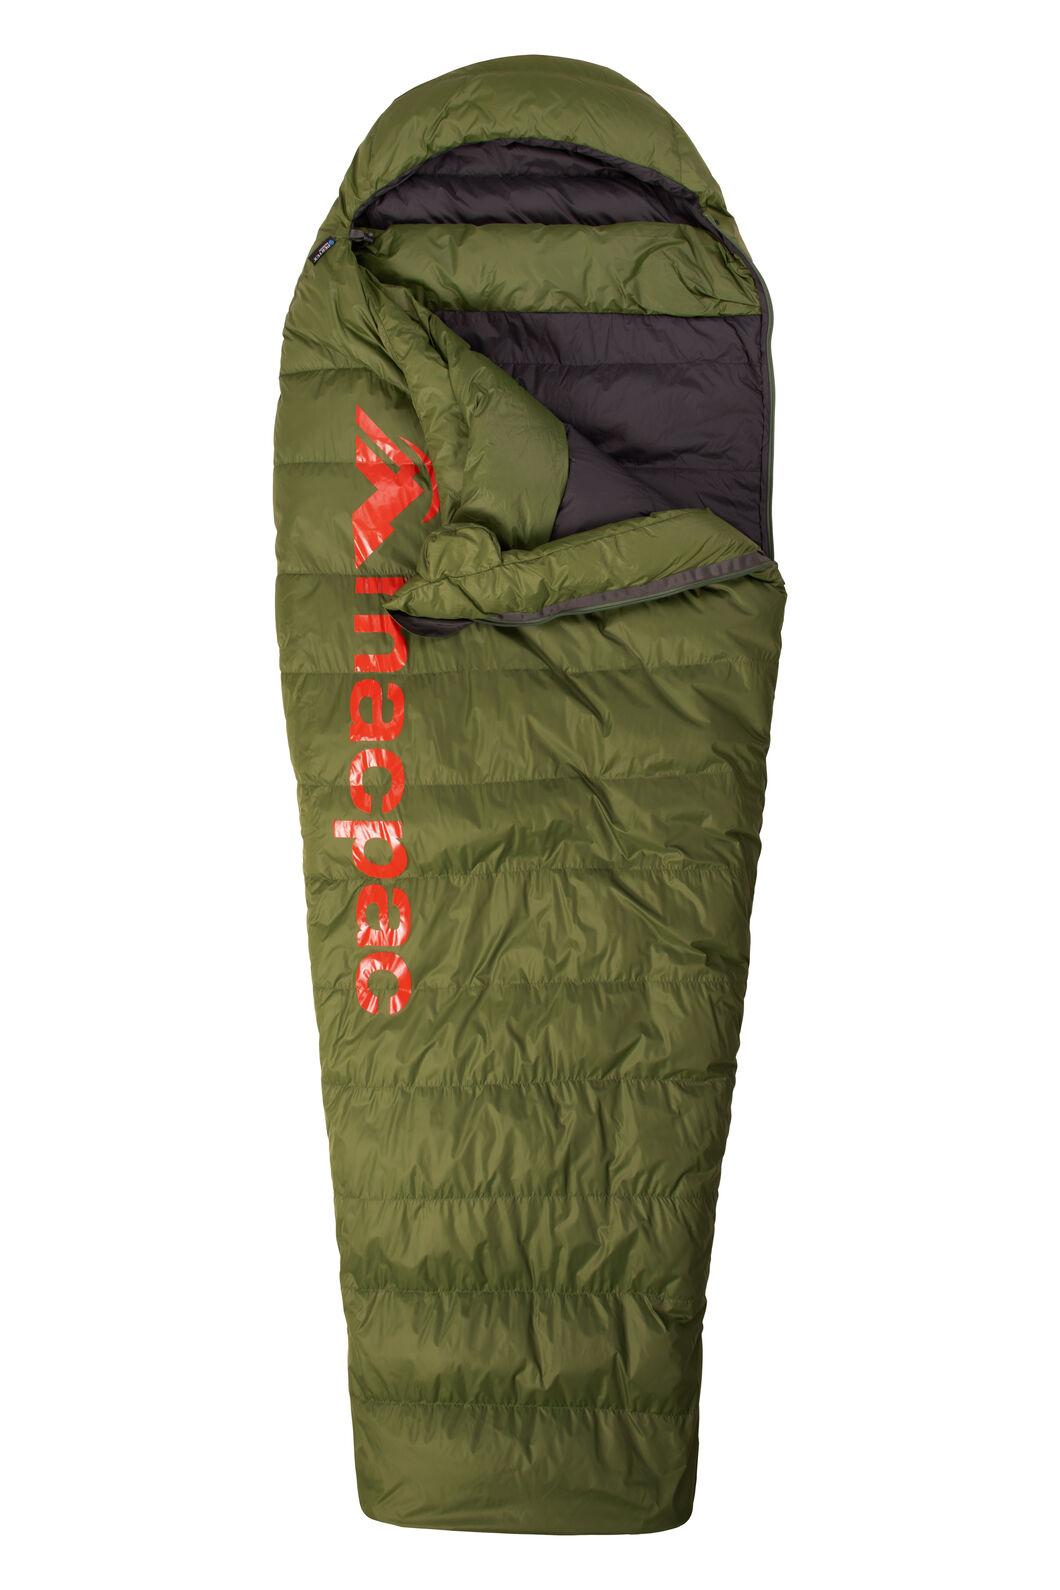 Macpac Overland 400 Women's Down Sleeping Bag, Chive, hi-res